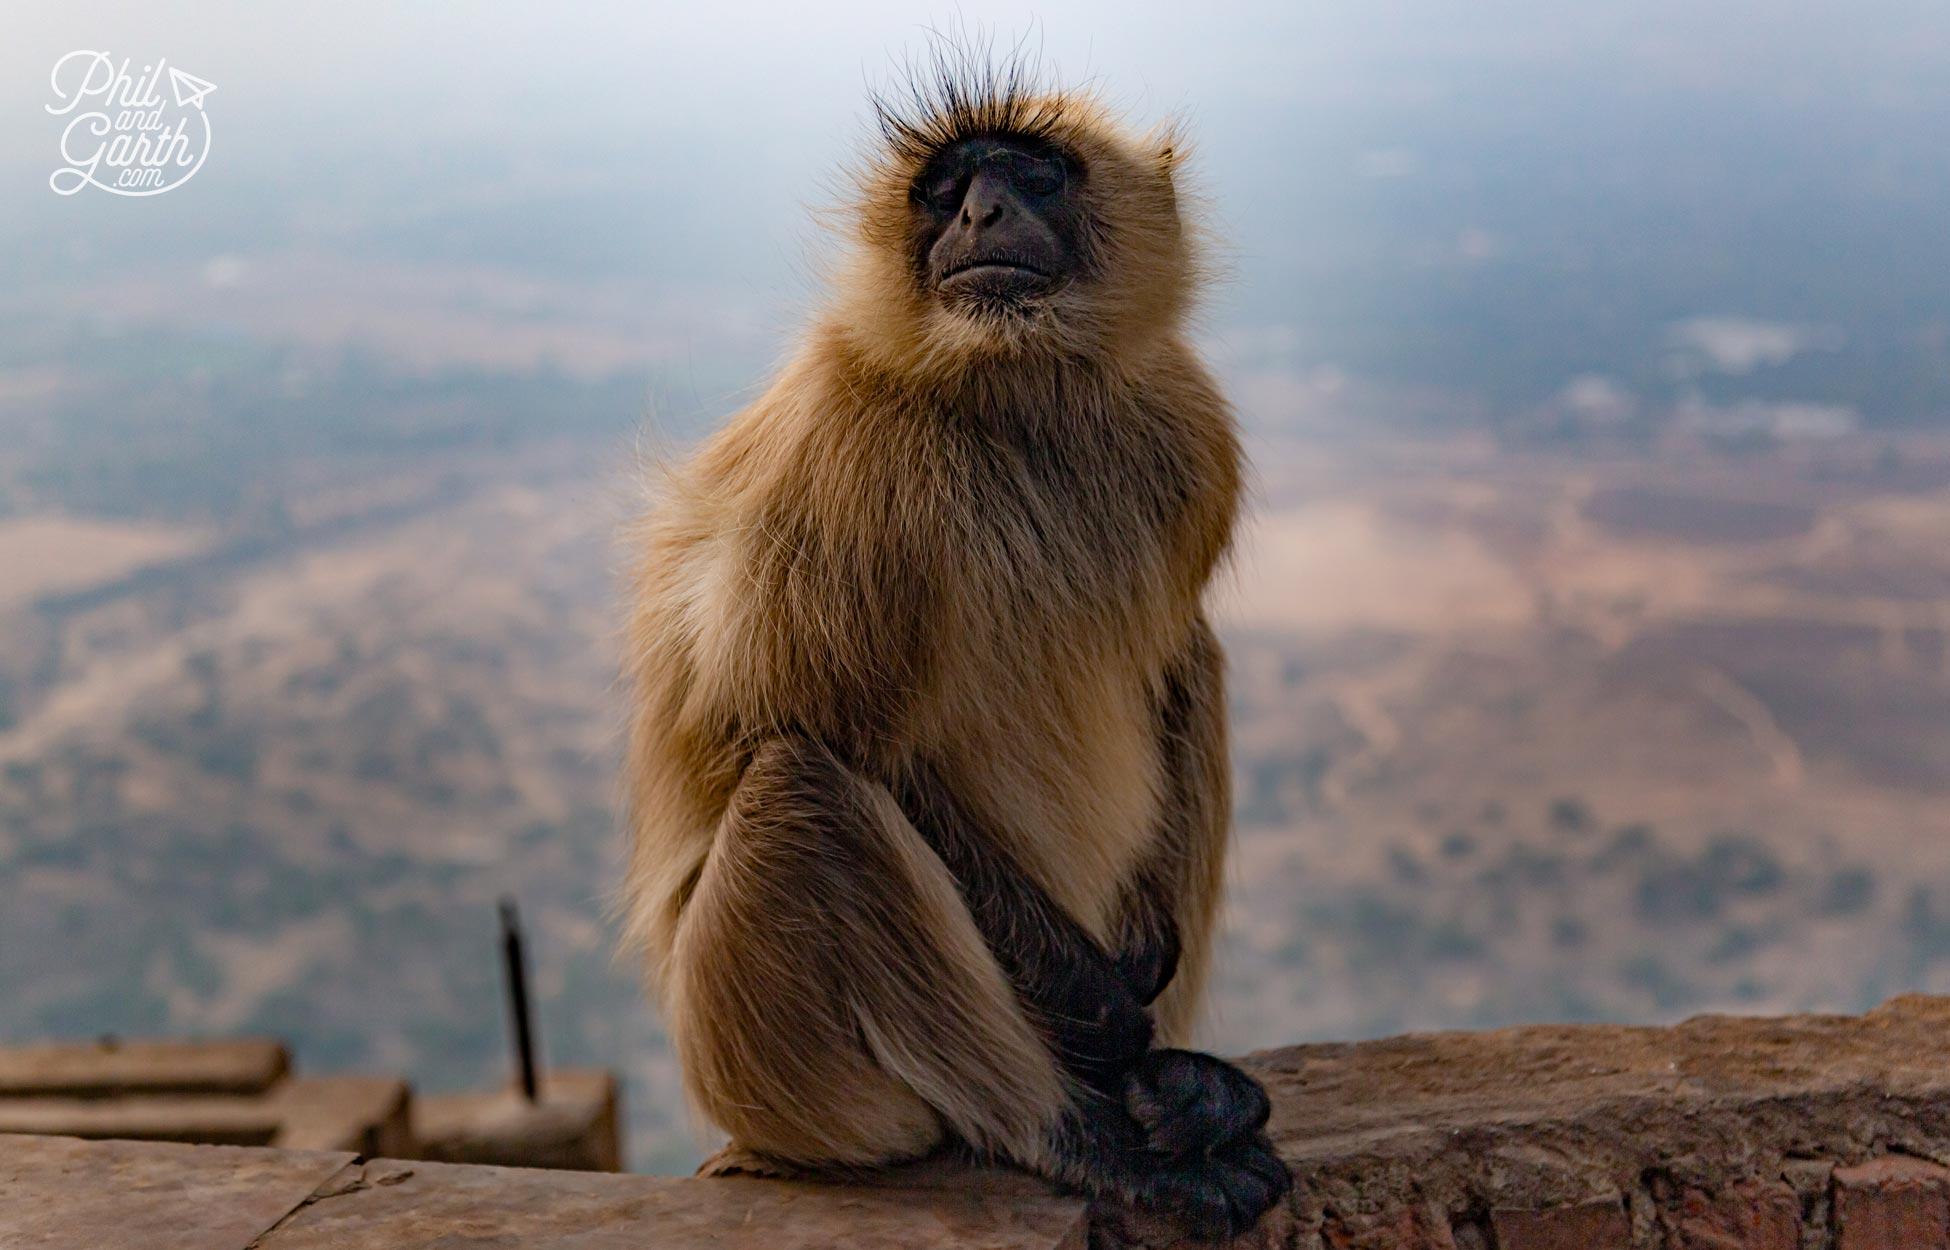 The cheeky monkeys at Savitri Temple